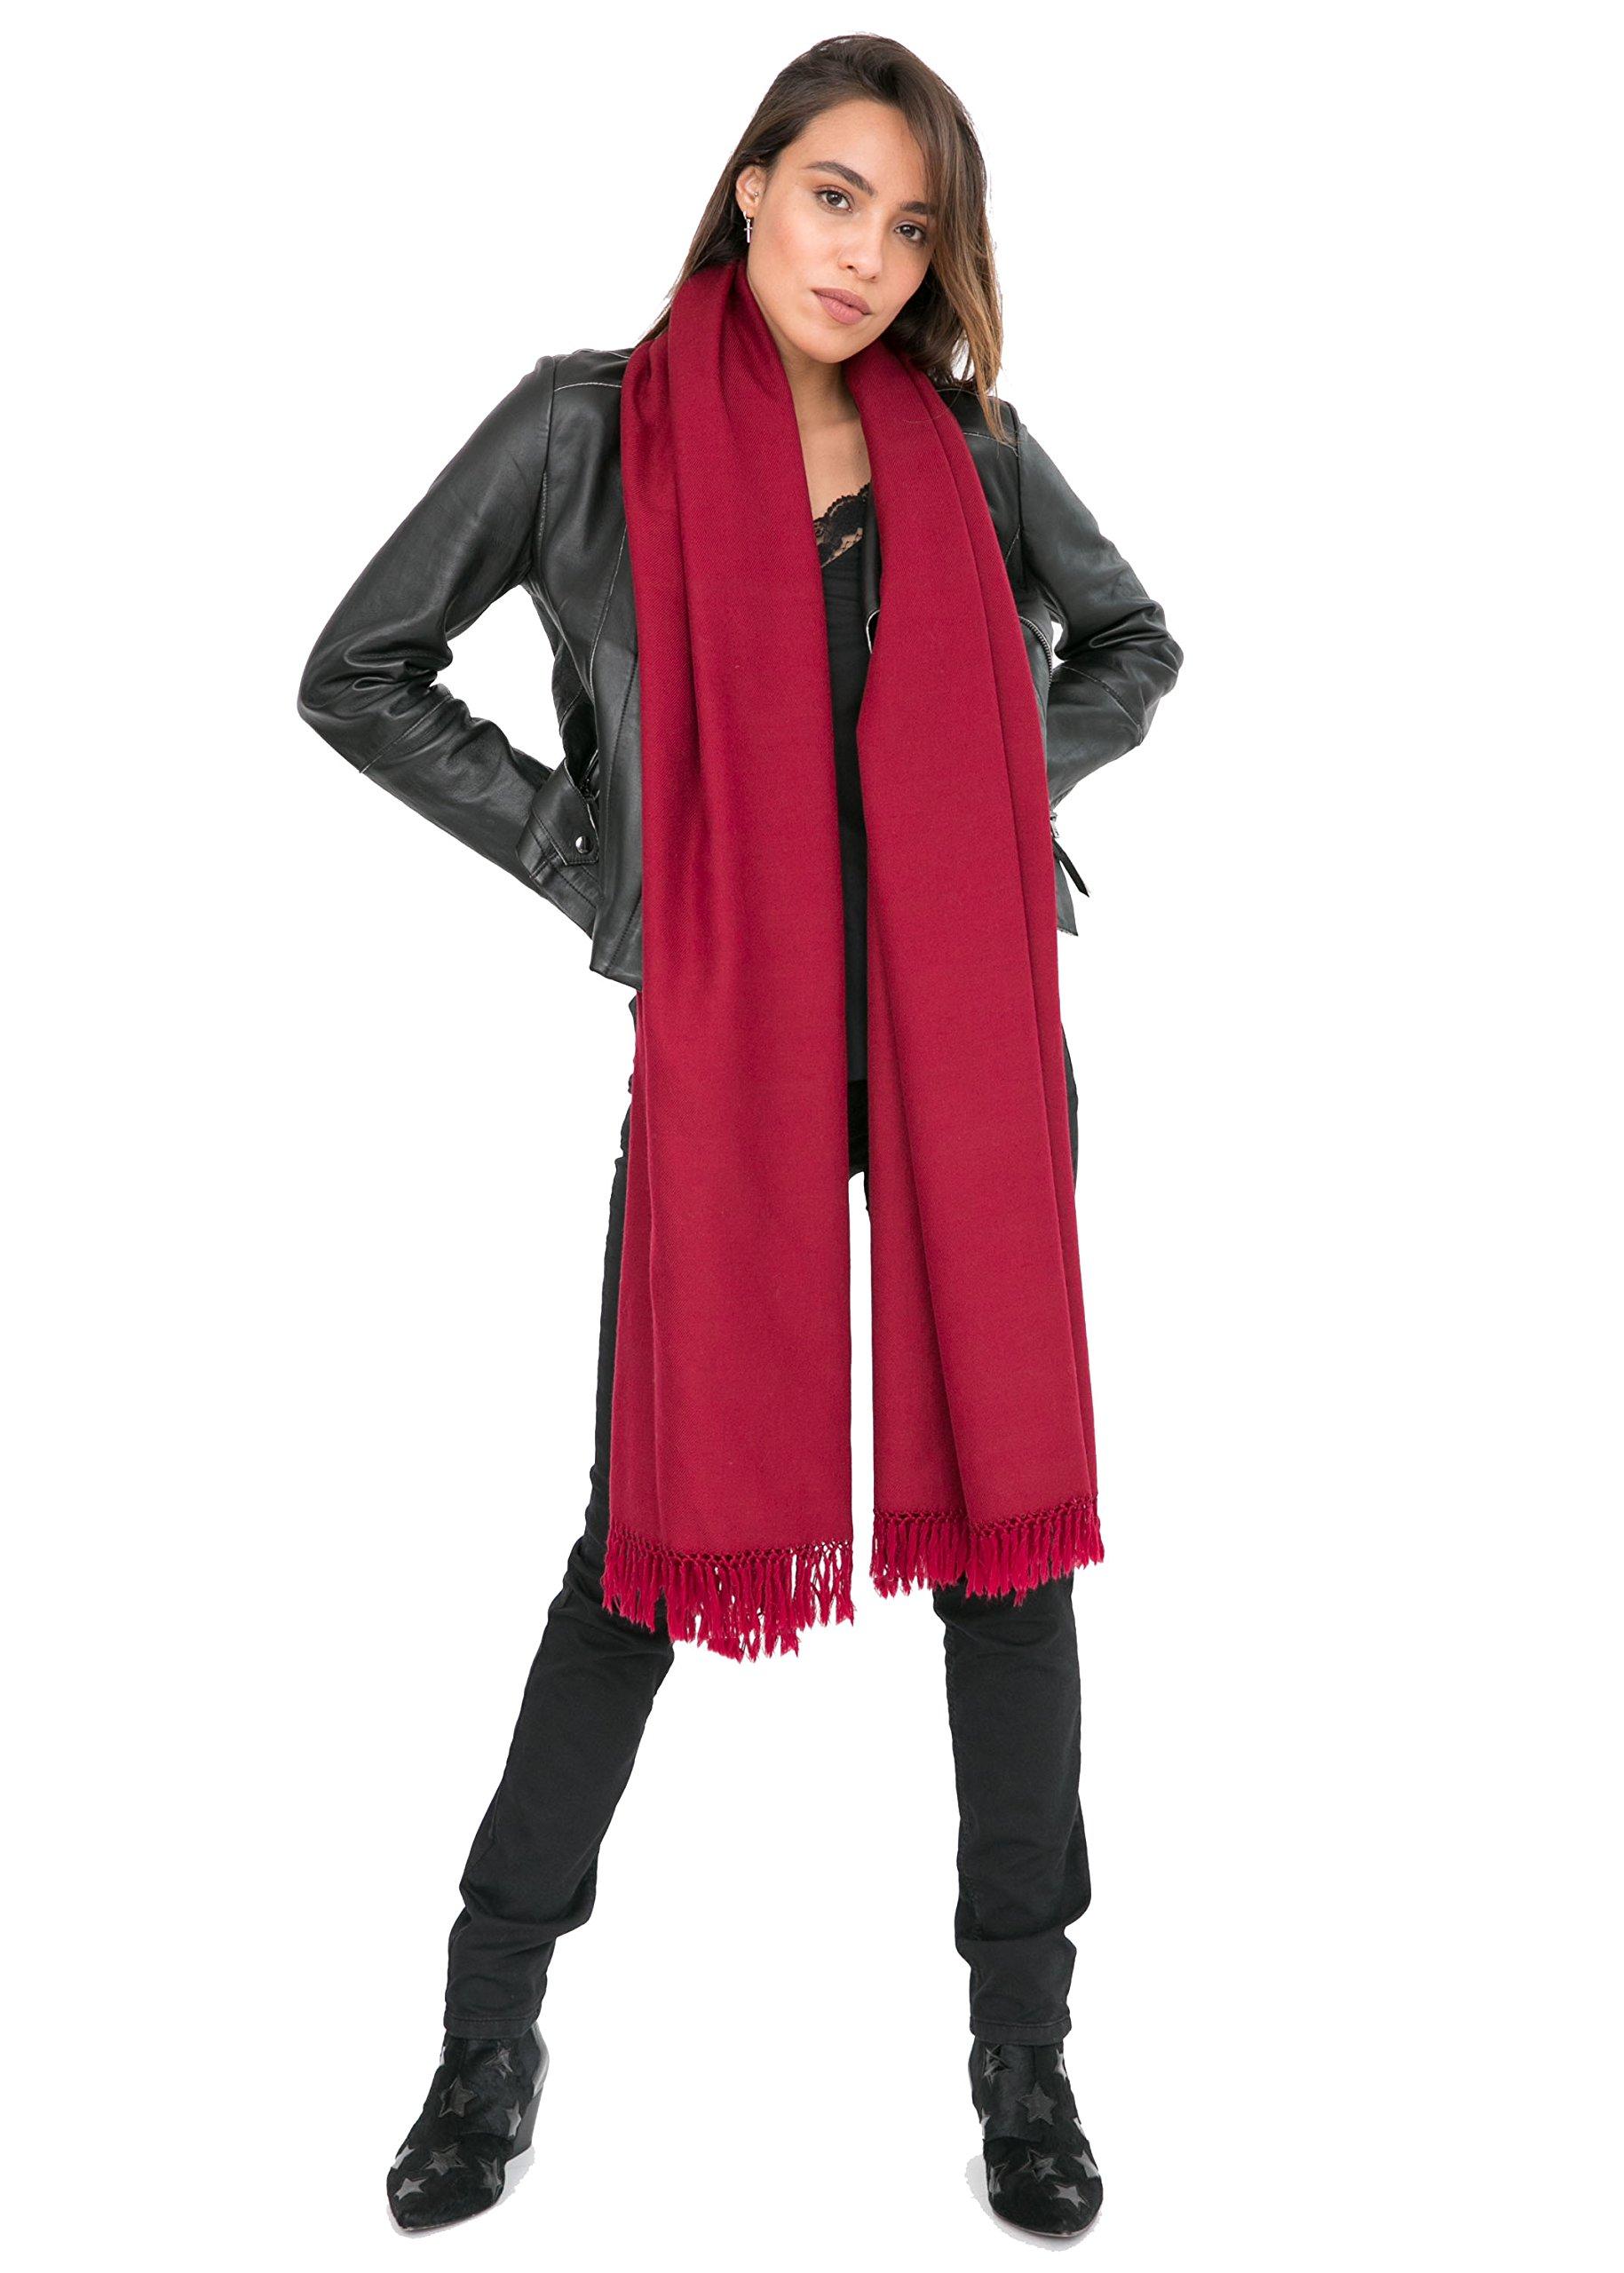 likemary Merino Wool Wrap Shawl & Blanket Scarf Oversize Fairtrade Pashmina Kasa Burgundy 100 x 215cm